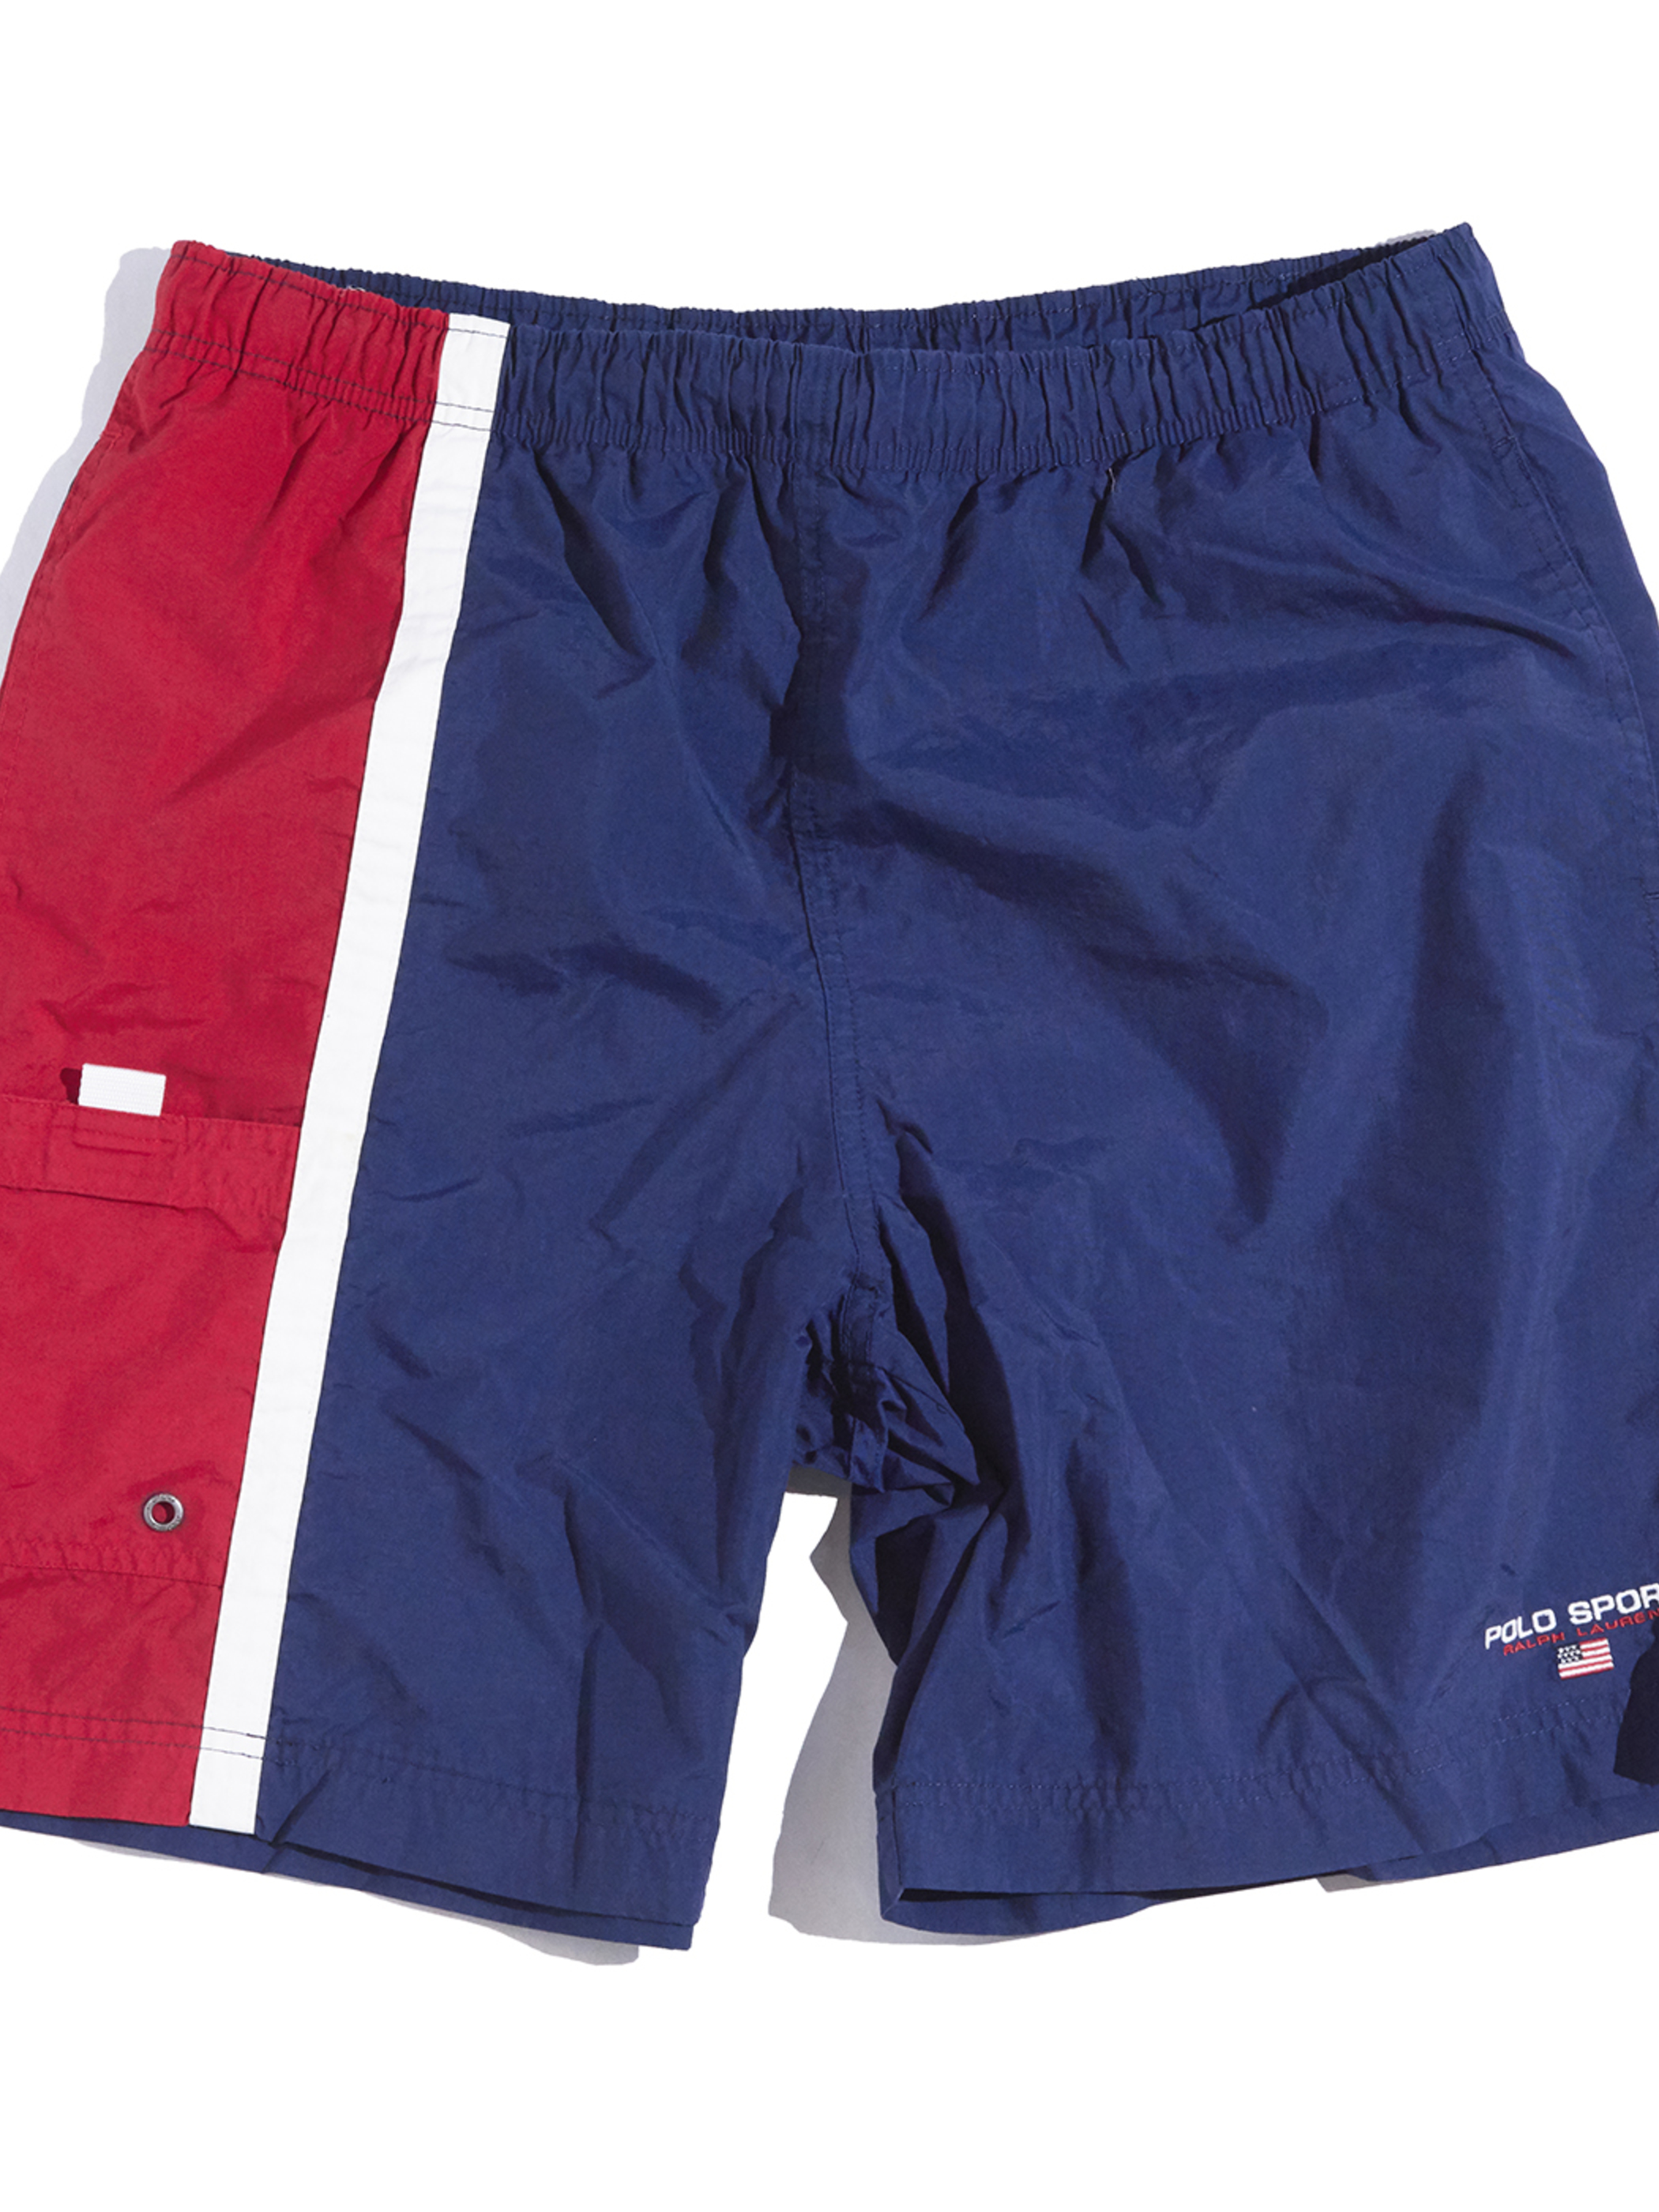 "1990s ""POLO SPORT"" swim shorts -NAVY-"